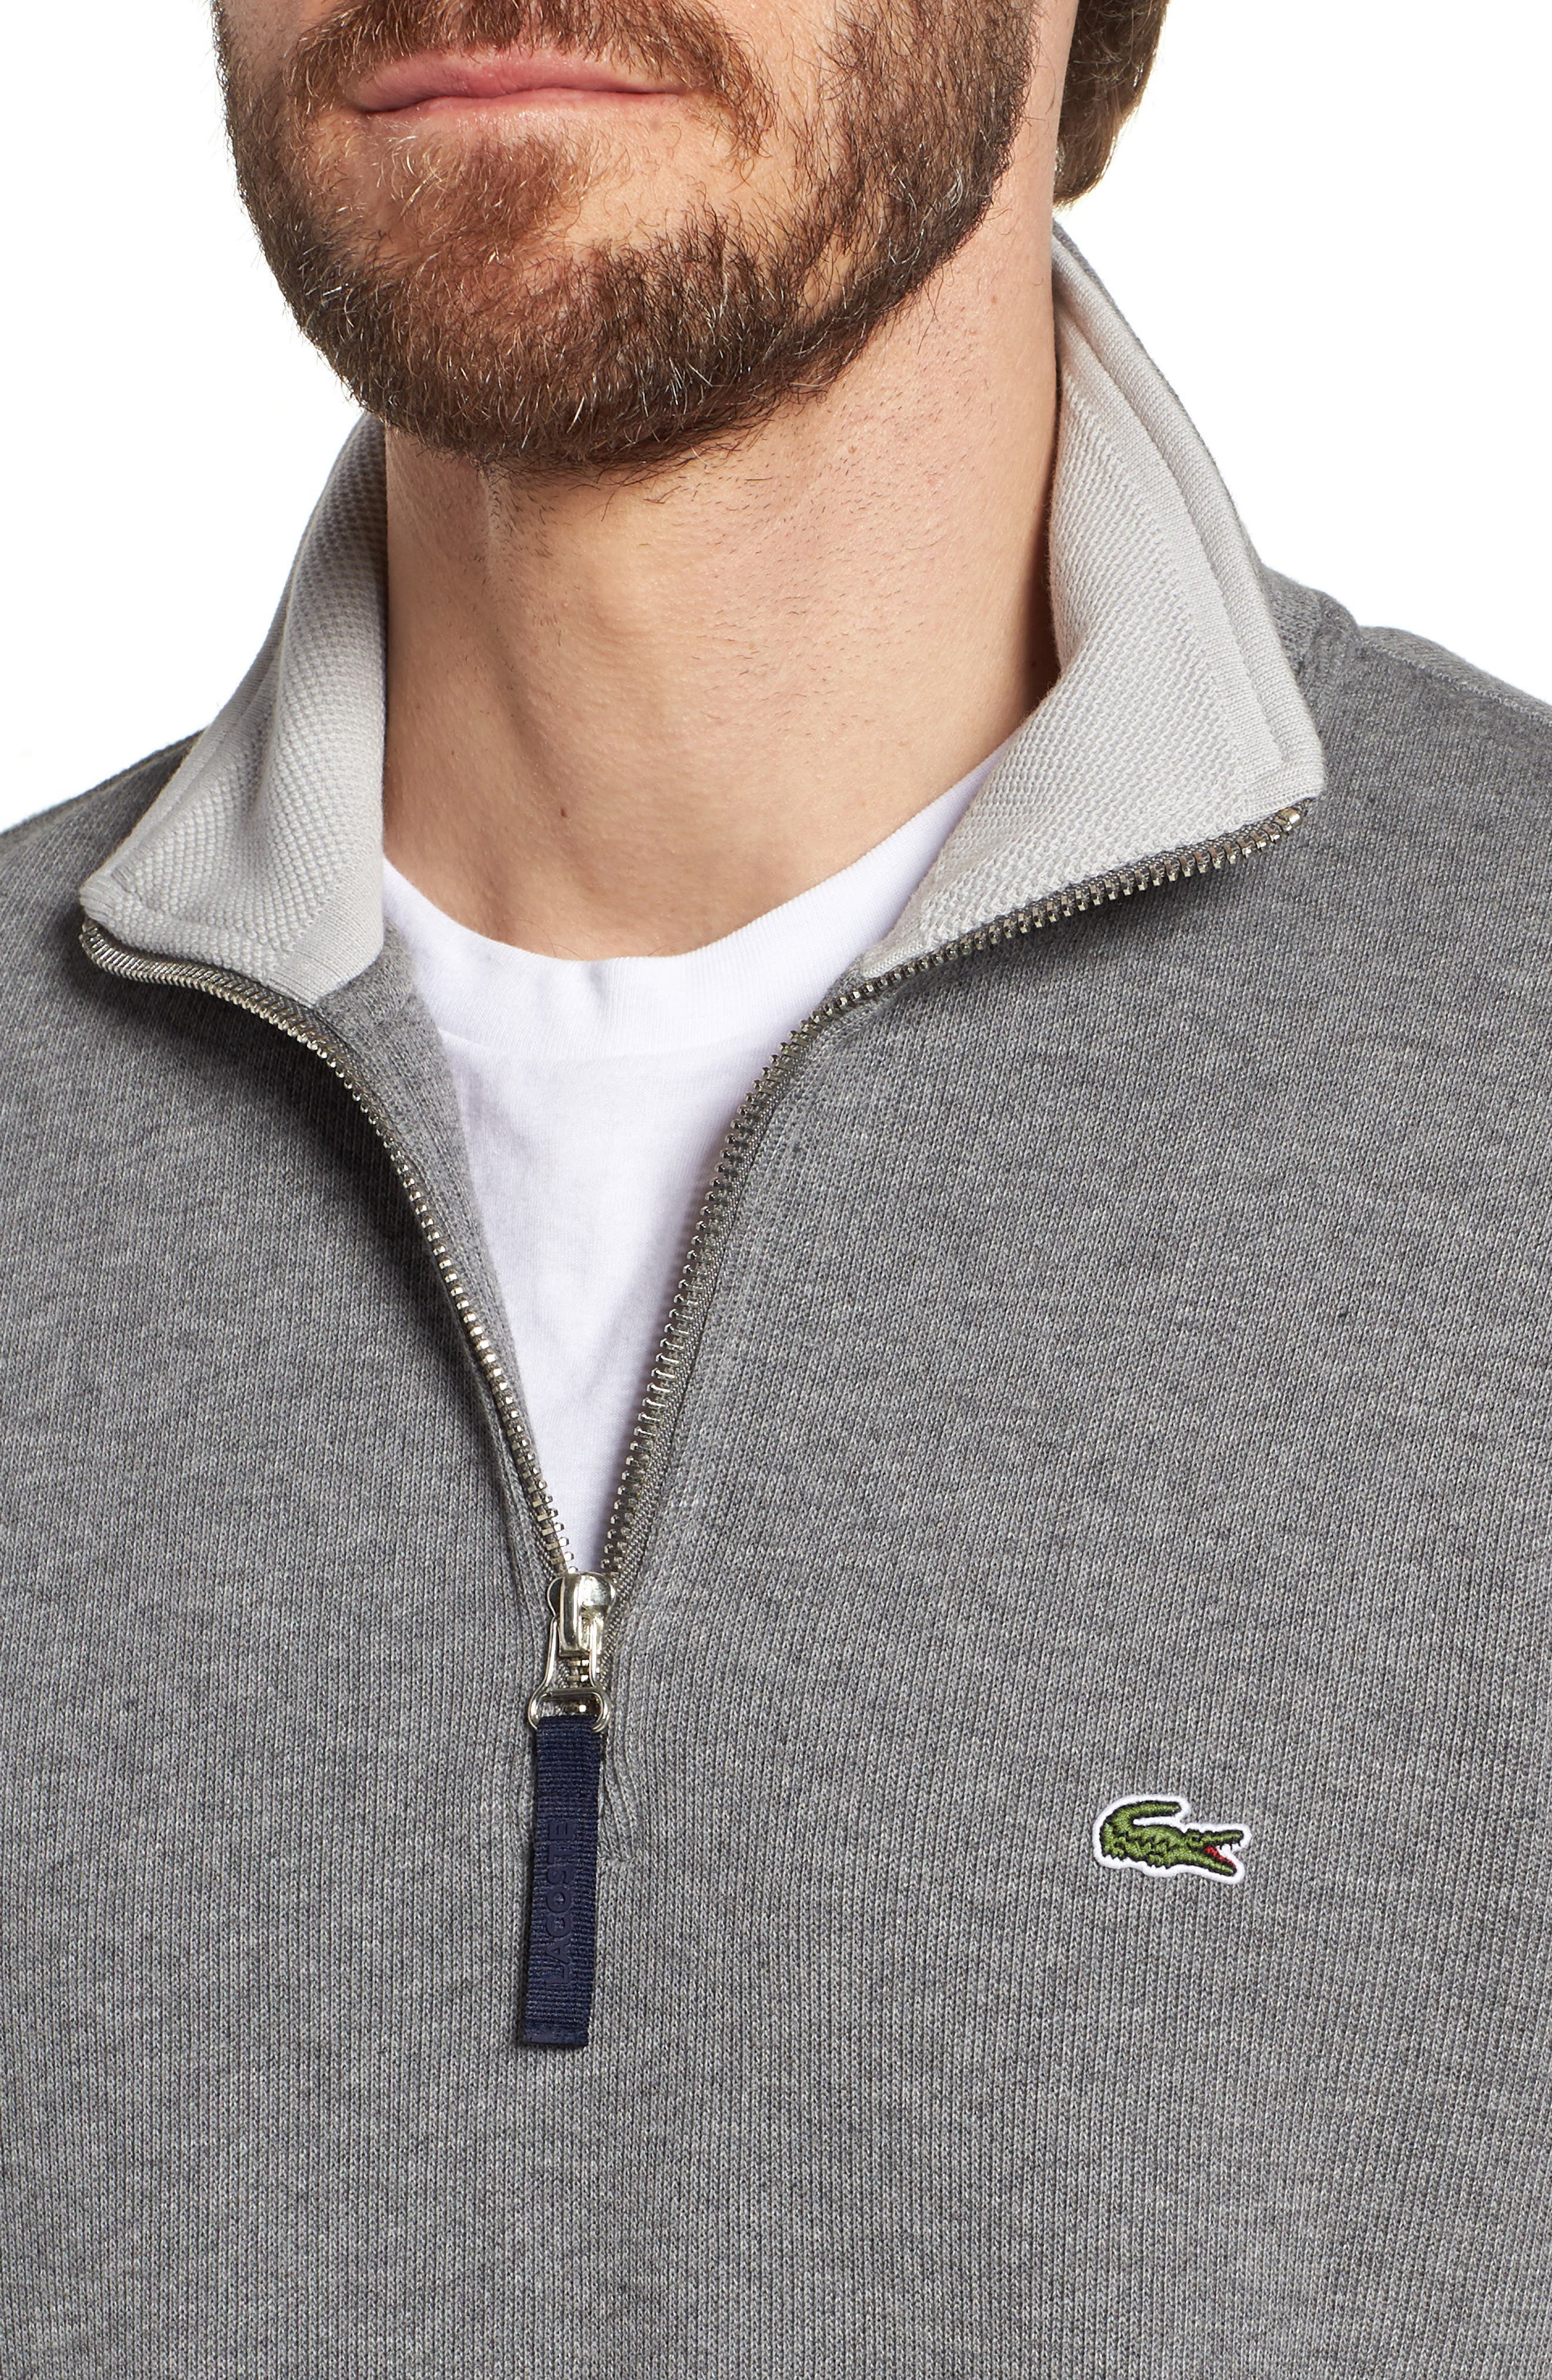 Quarter Zip Cotton Interlock Sweatshirt,                             Alternate thumbnail 4, color,                             GALAXITE CHINE/ NIMBUS